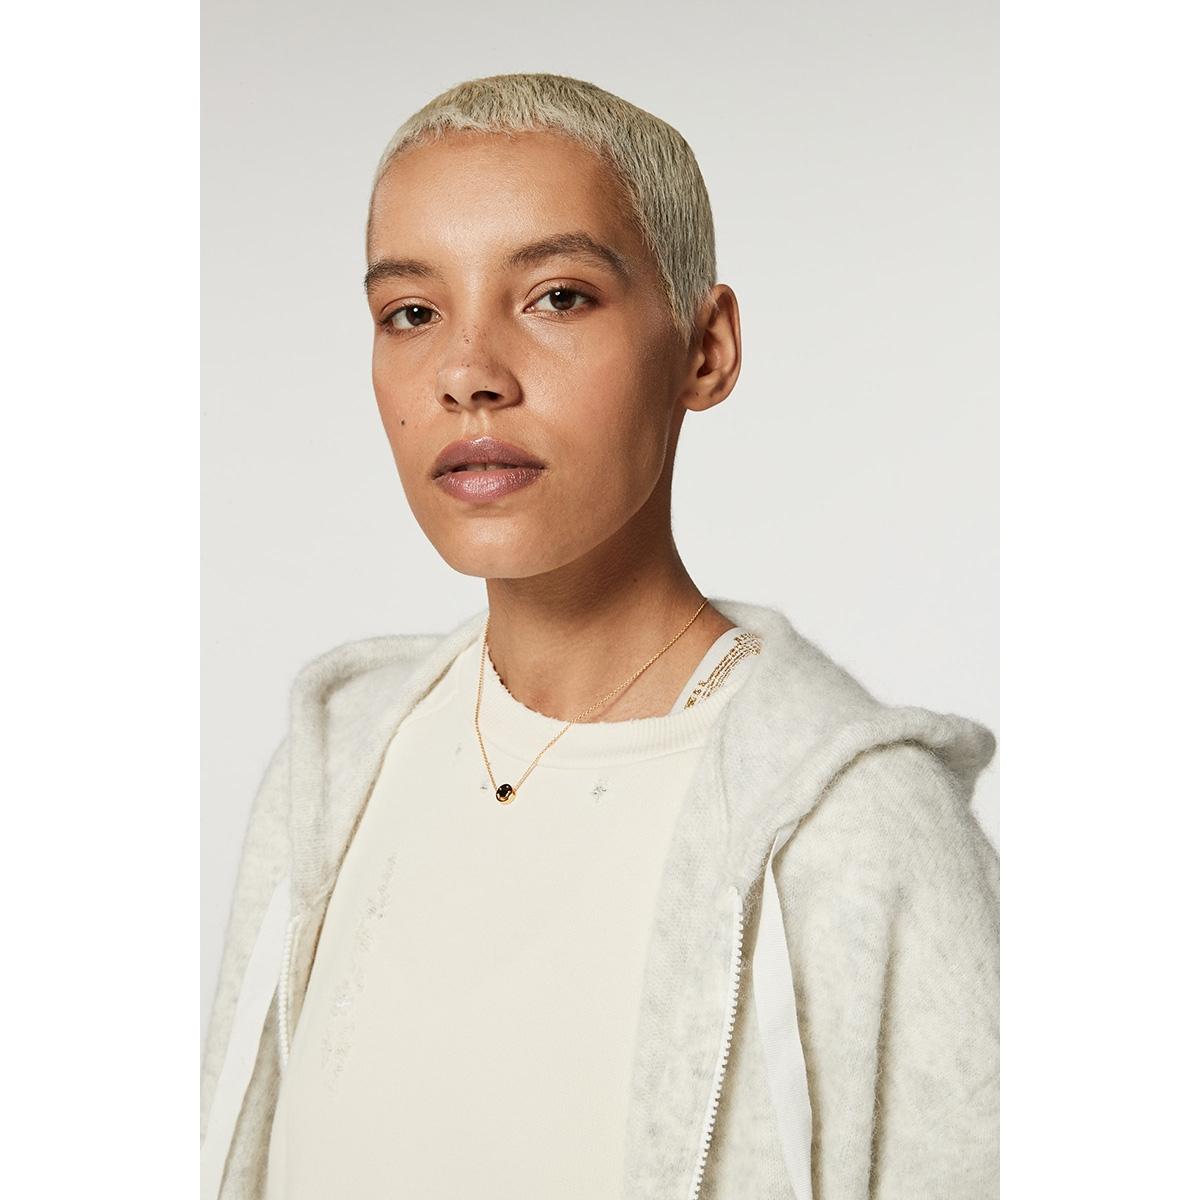 hoody merino wool 20 660 9103 10 days vest soft white melee